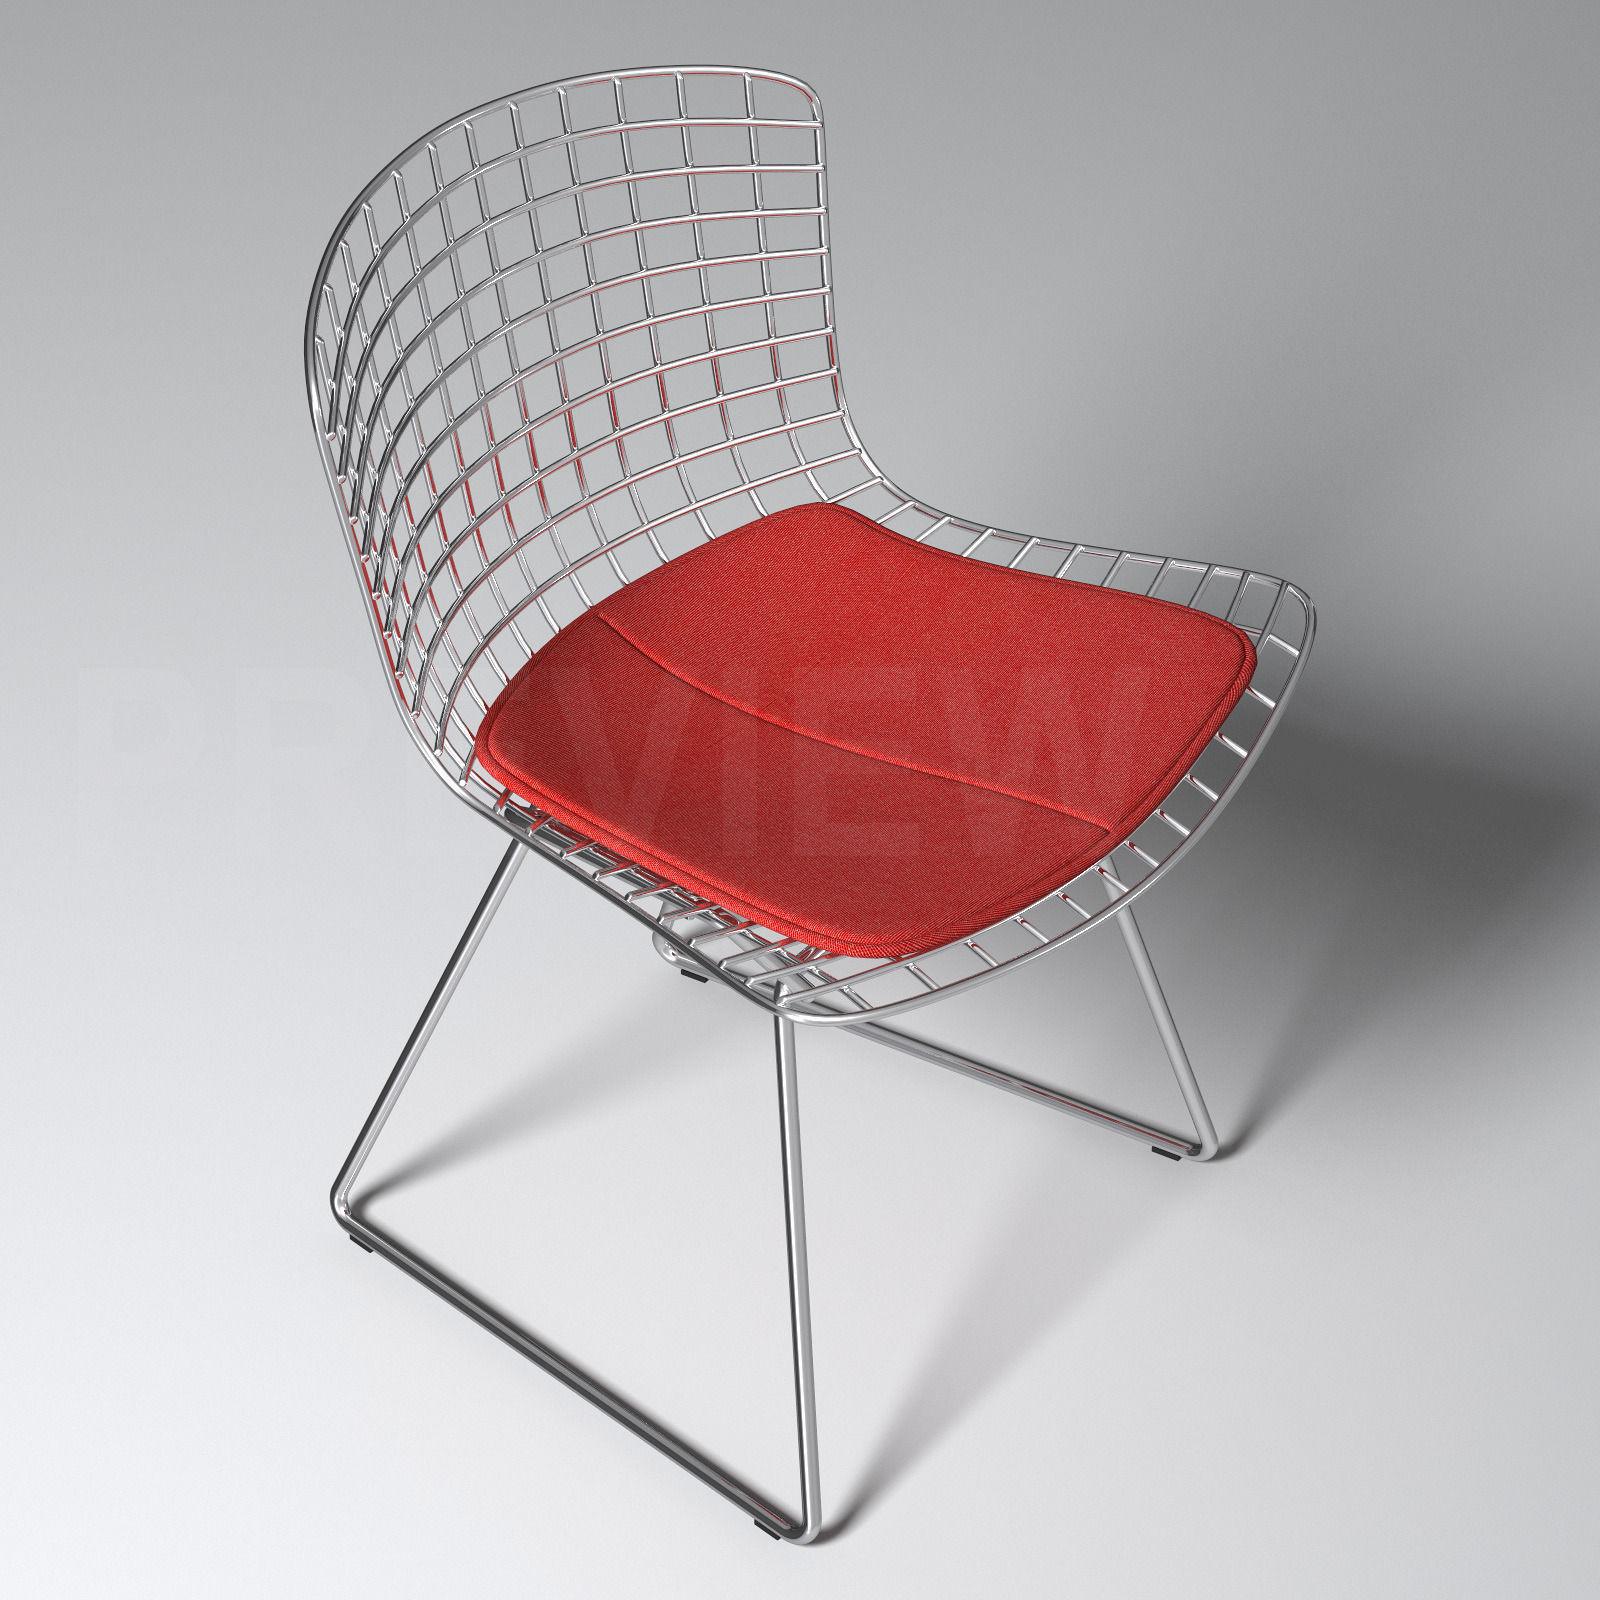 Bertoia Chair Knoll -  bertoia side chair knoll 3d model max obj fbx 3